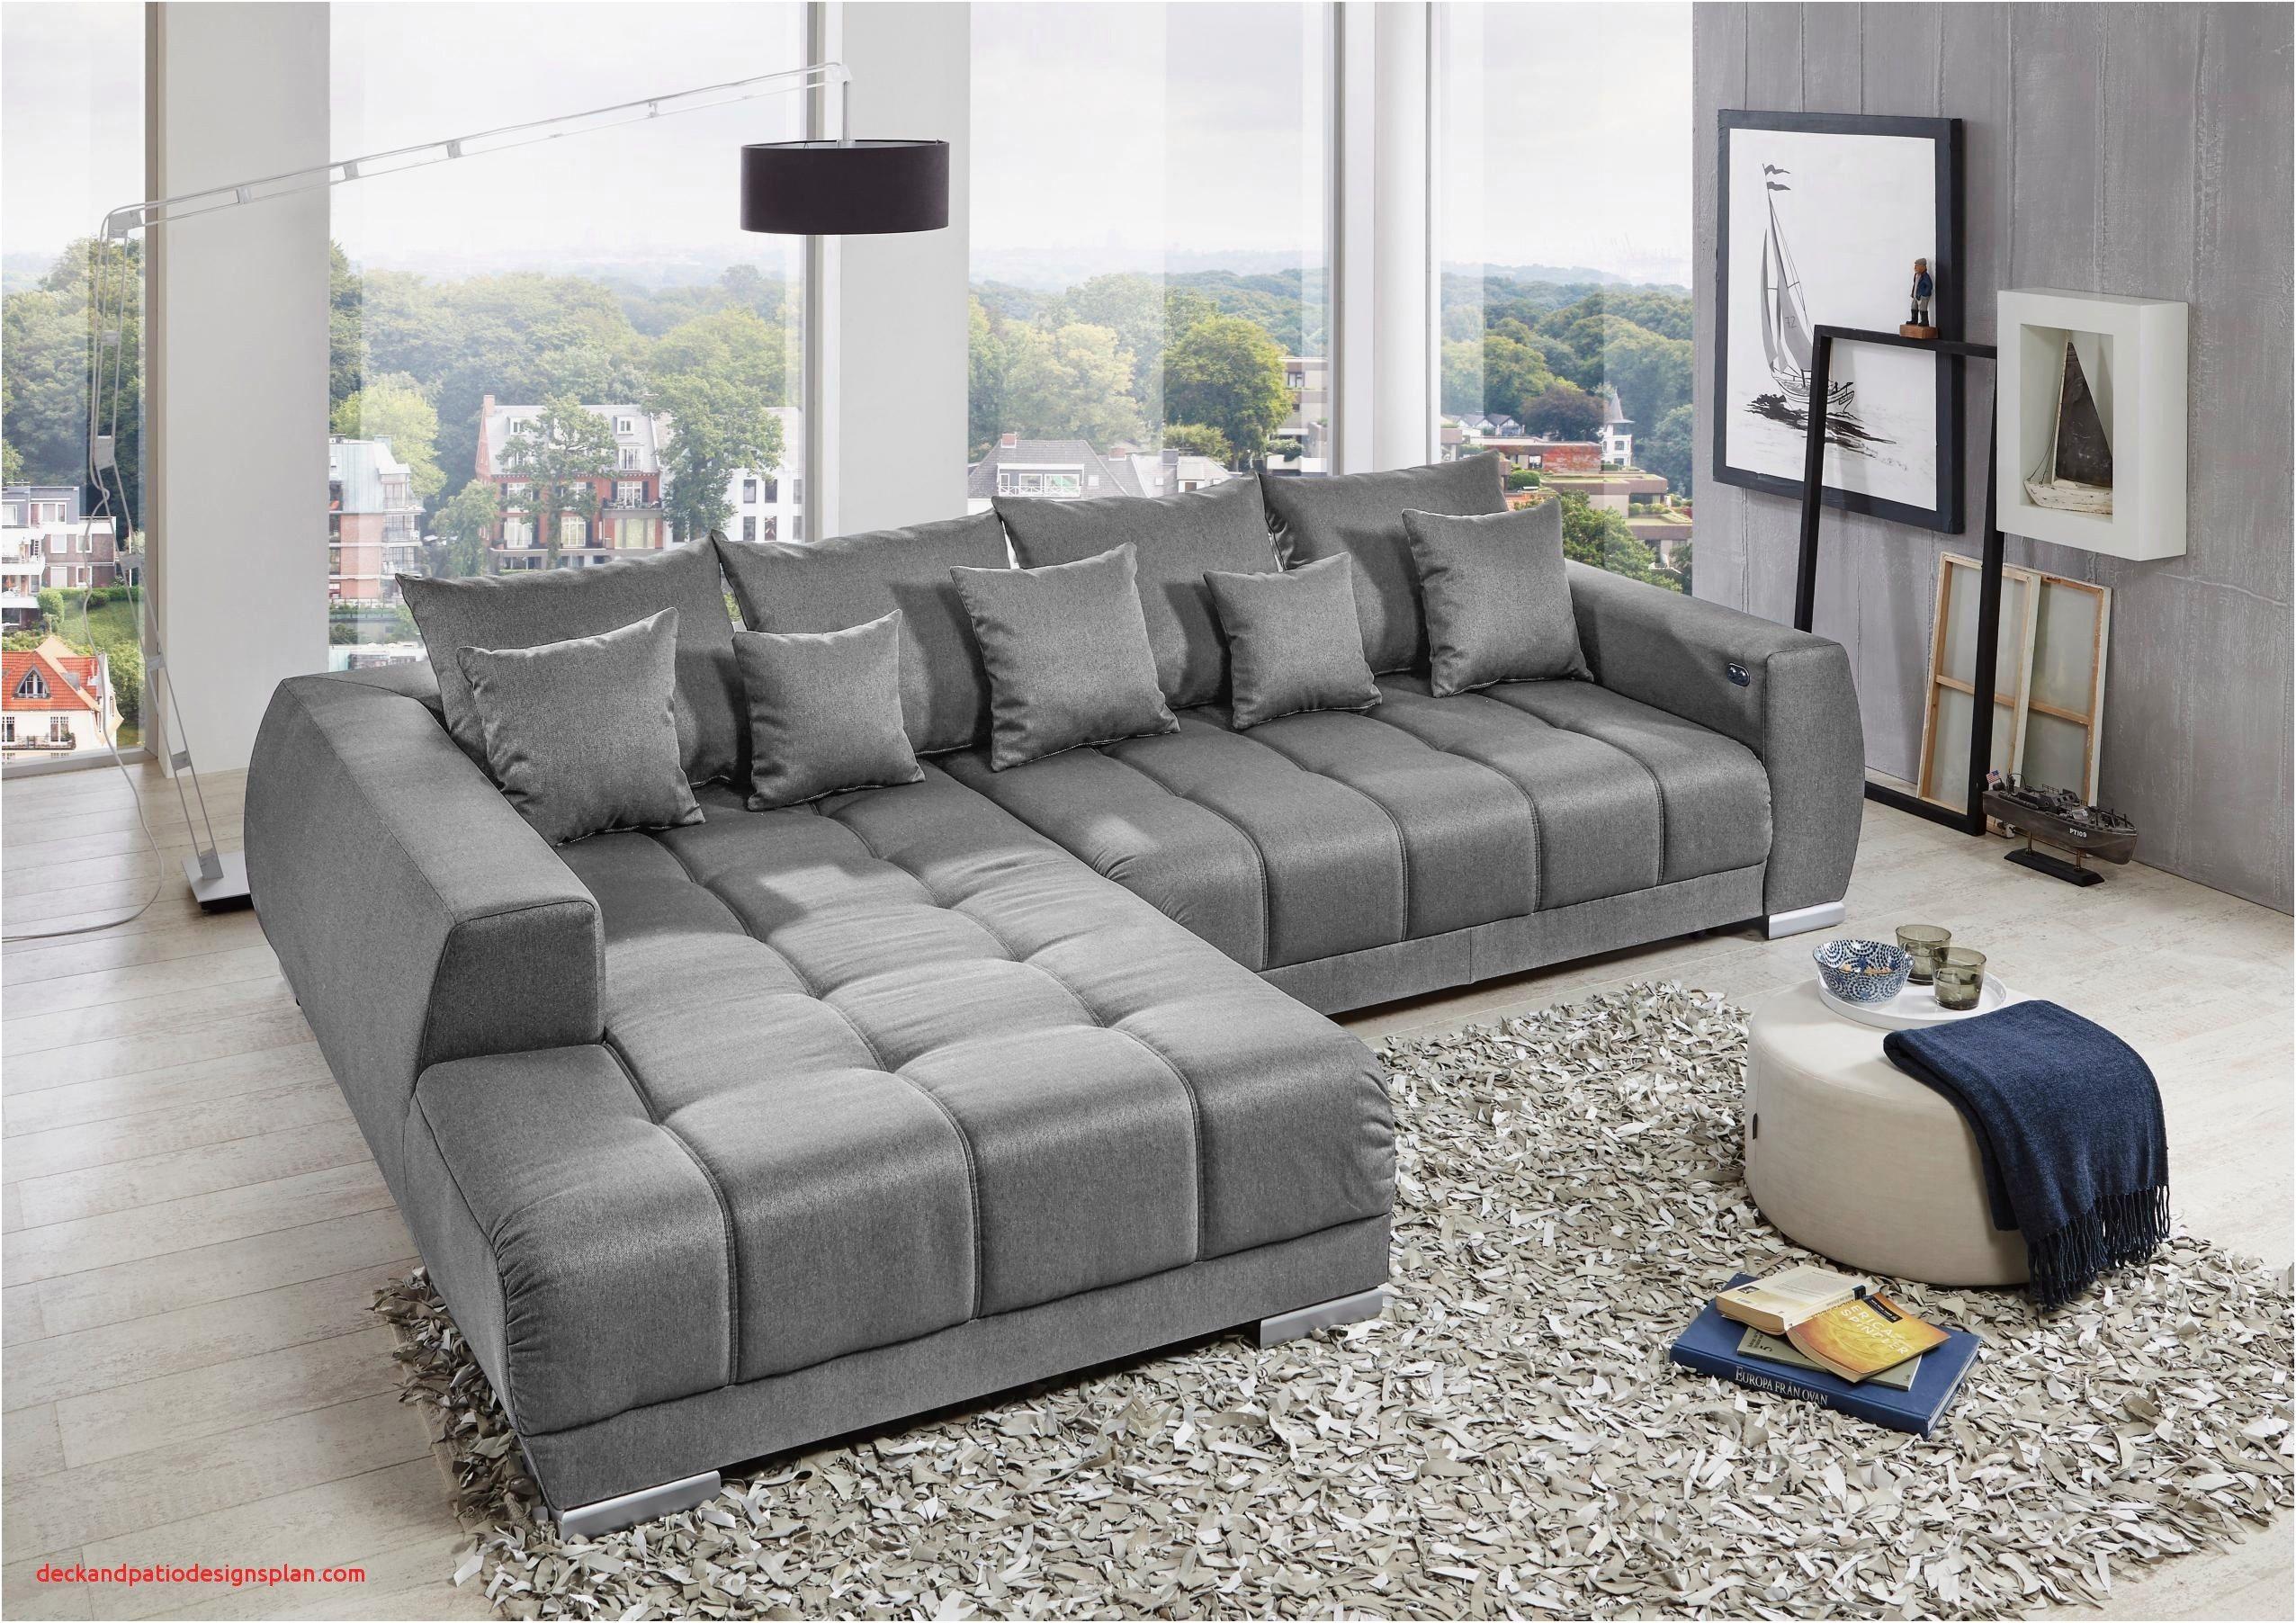 Big Sofa Roller Graues Sofa Gunstig Sofas Couch Kaufen Gunstig Zachary Gray Di 2020